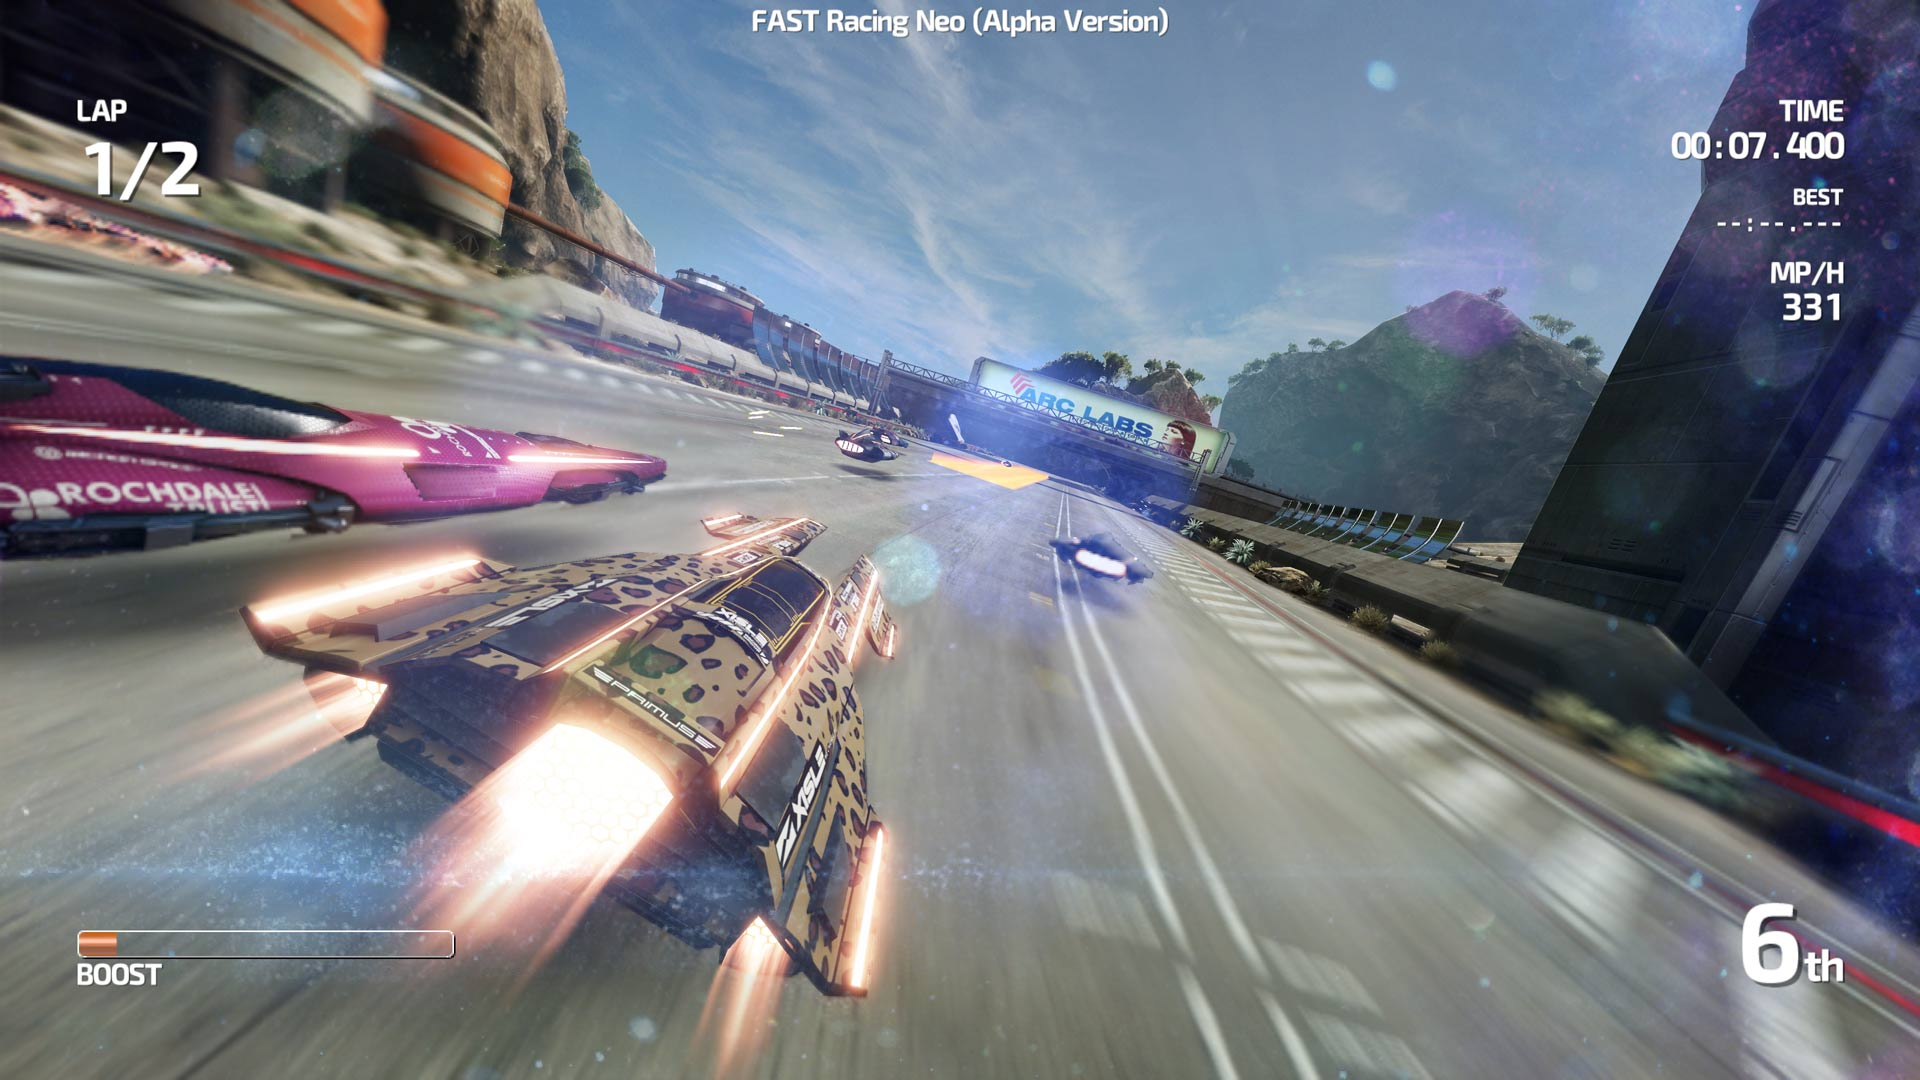 1433331375-fast-racing-neo-1